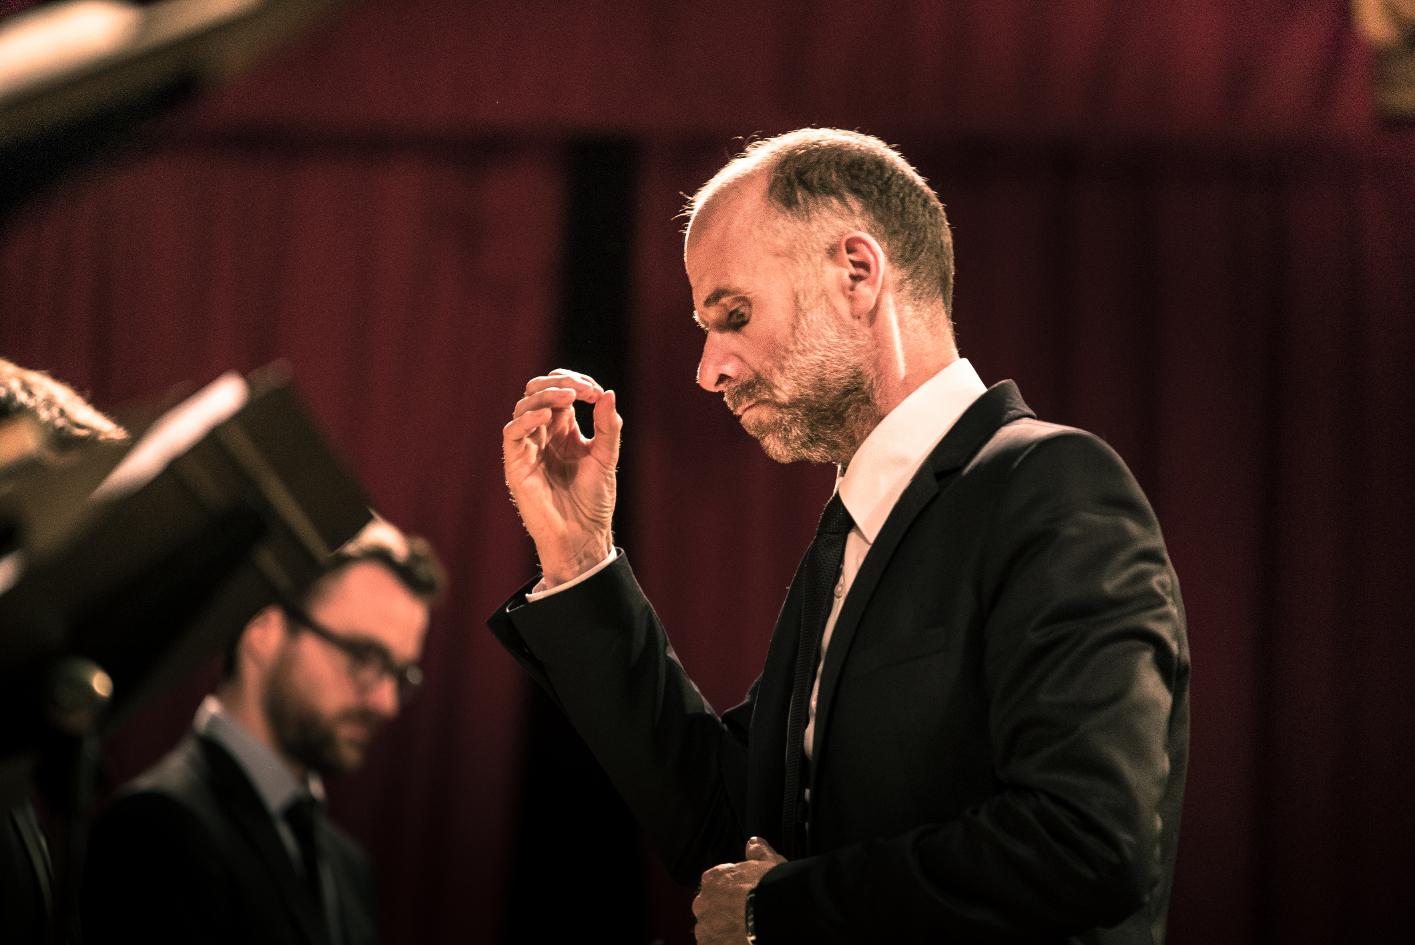 concert-hostel-dieu-haendel-fe-comte-dixit-dominus-credit-Combier